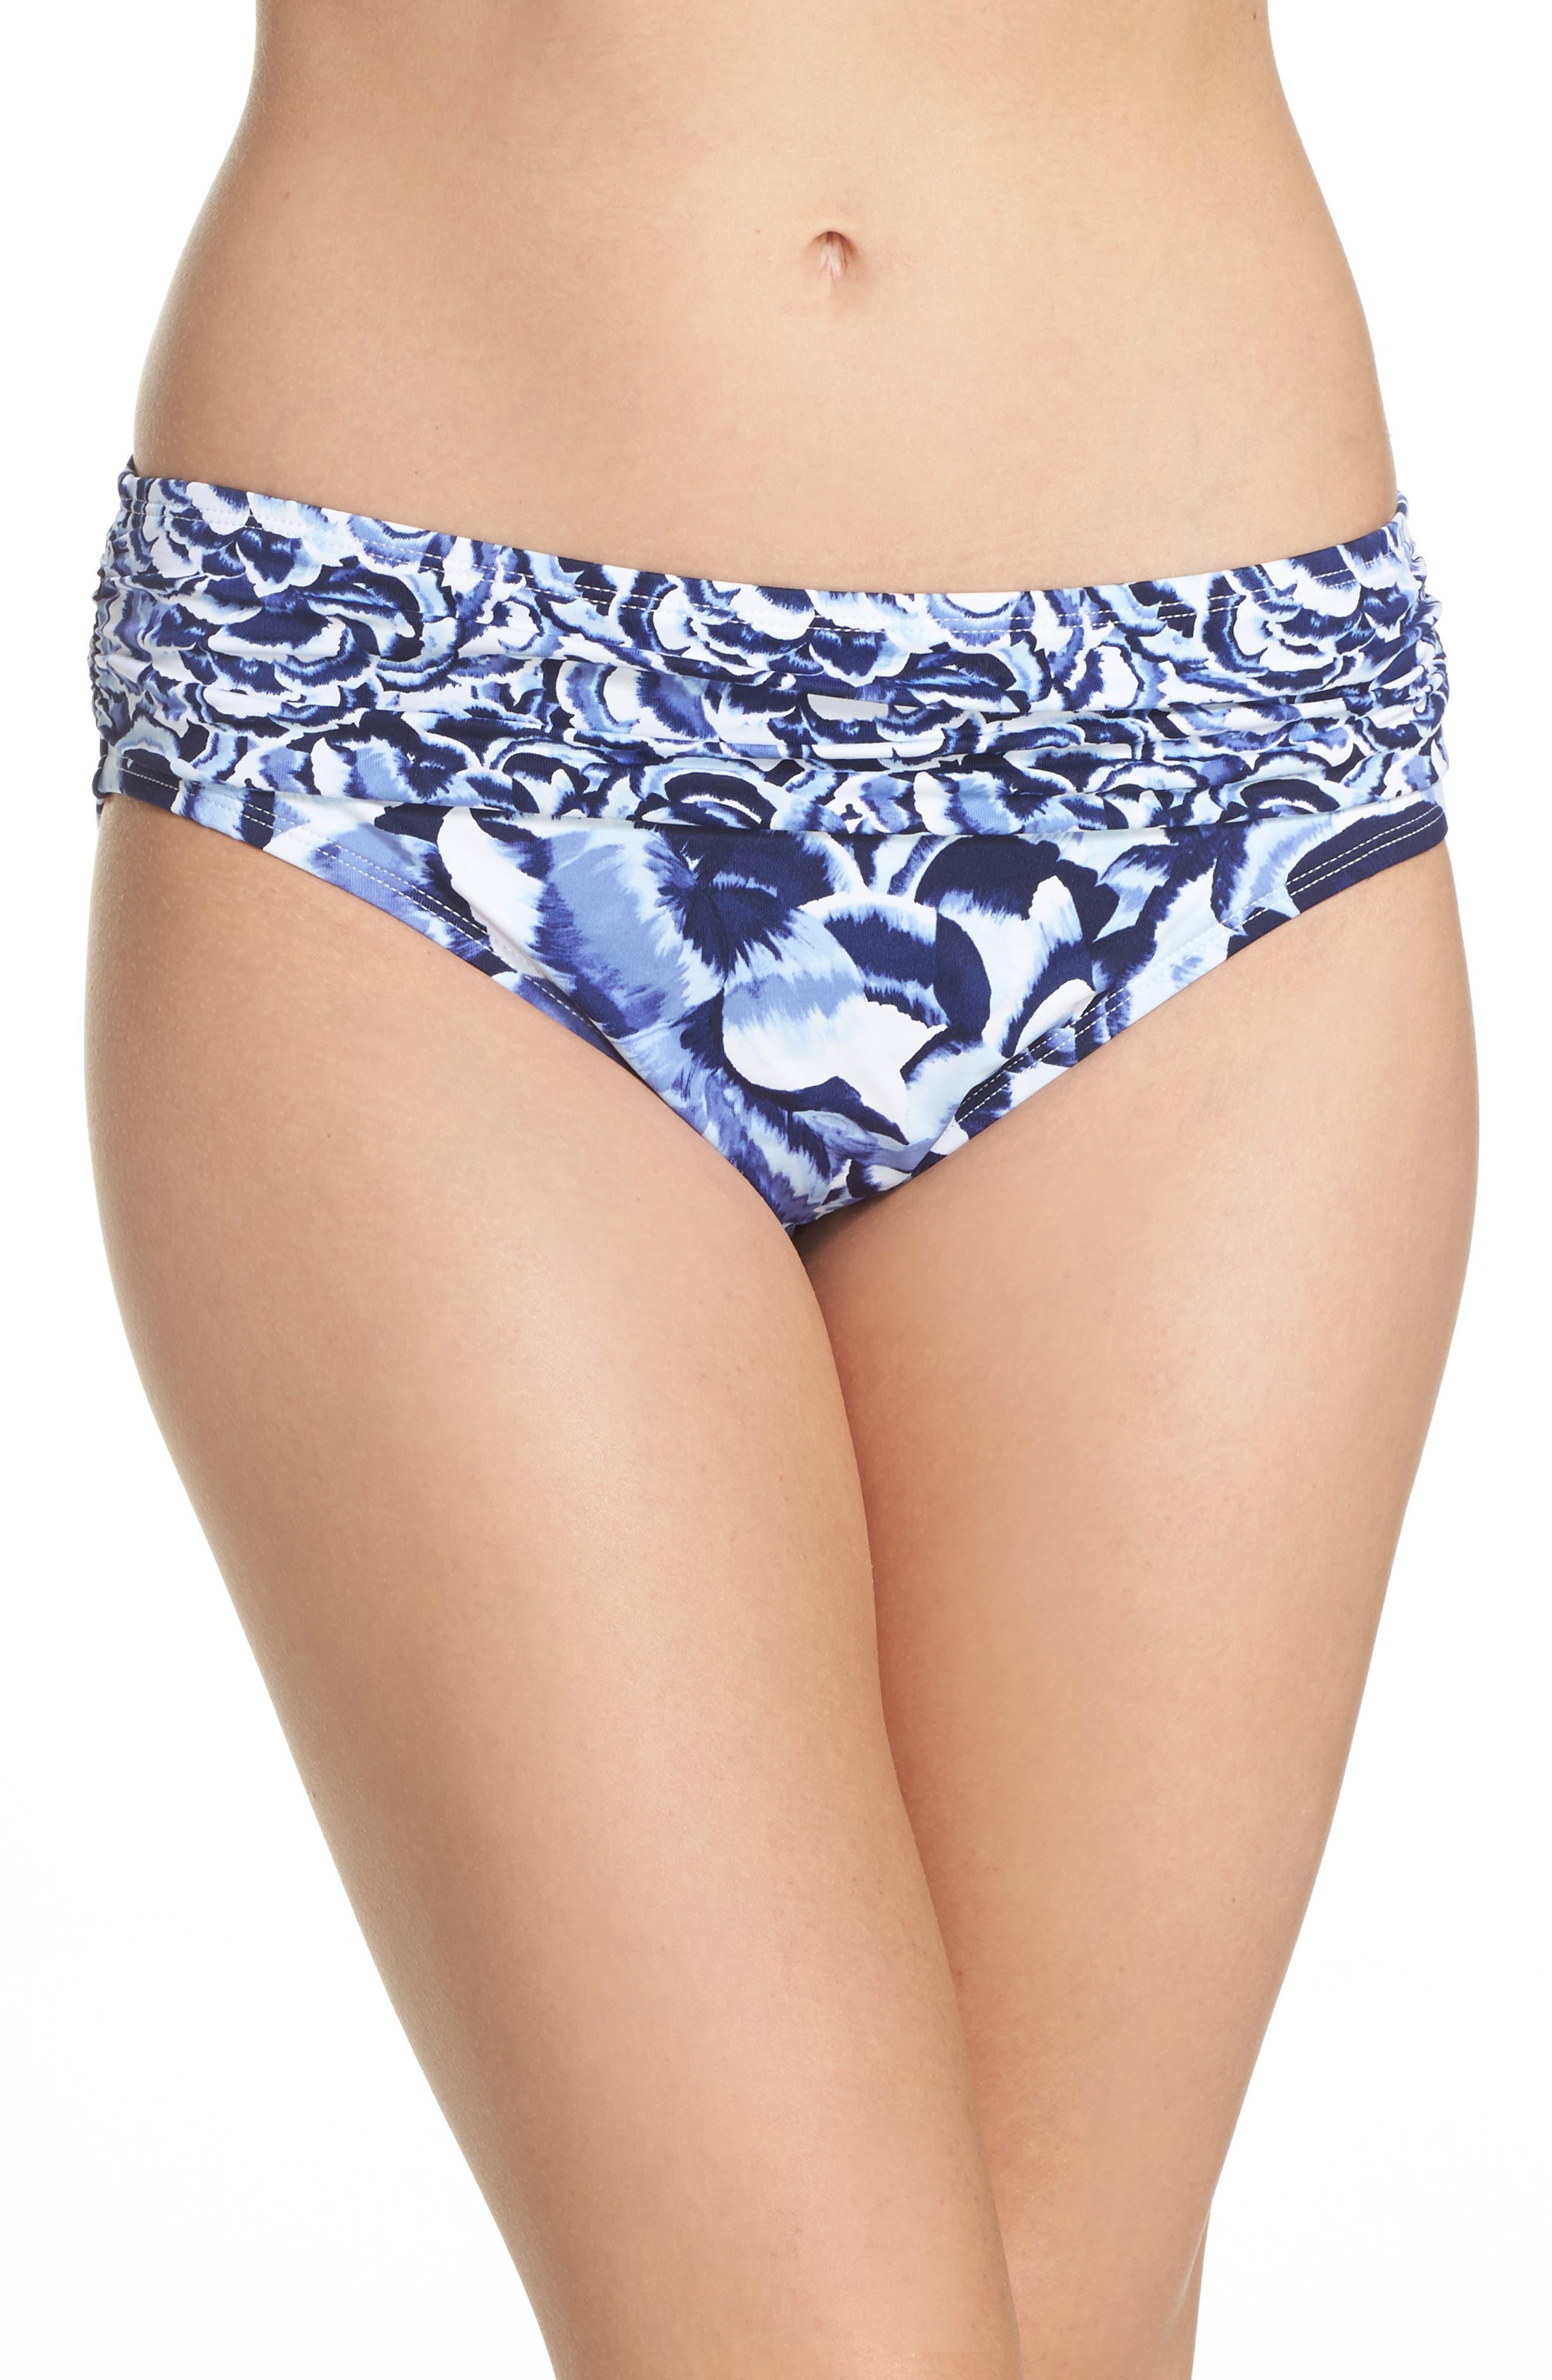 Alternate Image 1 Selected - Tommy Bahama Pansy Petal Brief Bikini Bottoms